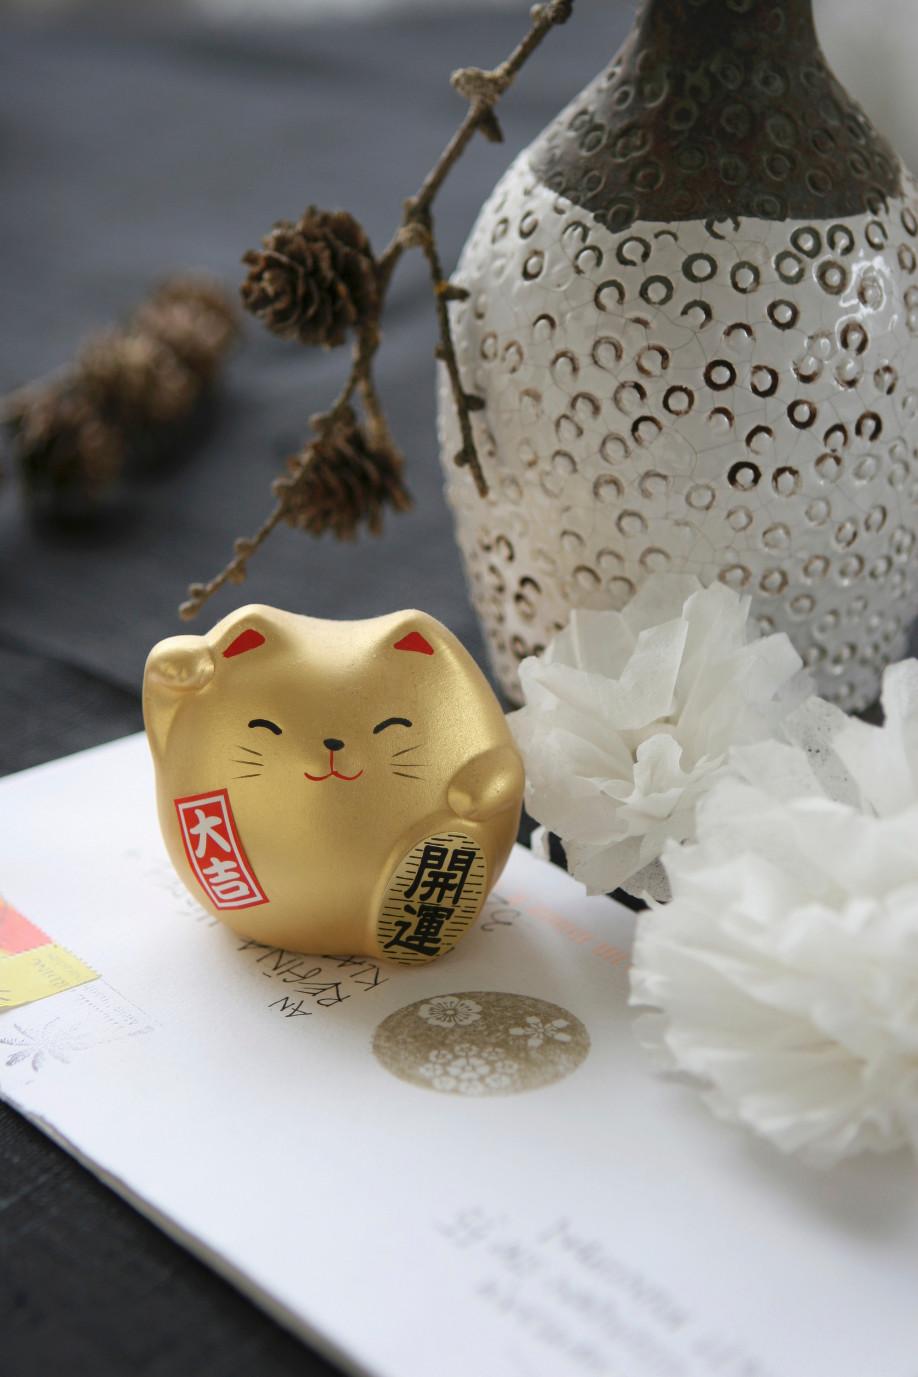 westwing-japanische-gluecksbringer-winkekatze